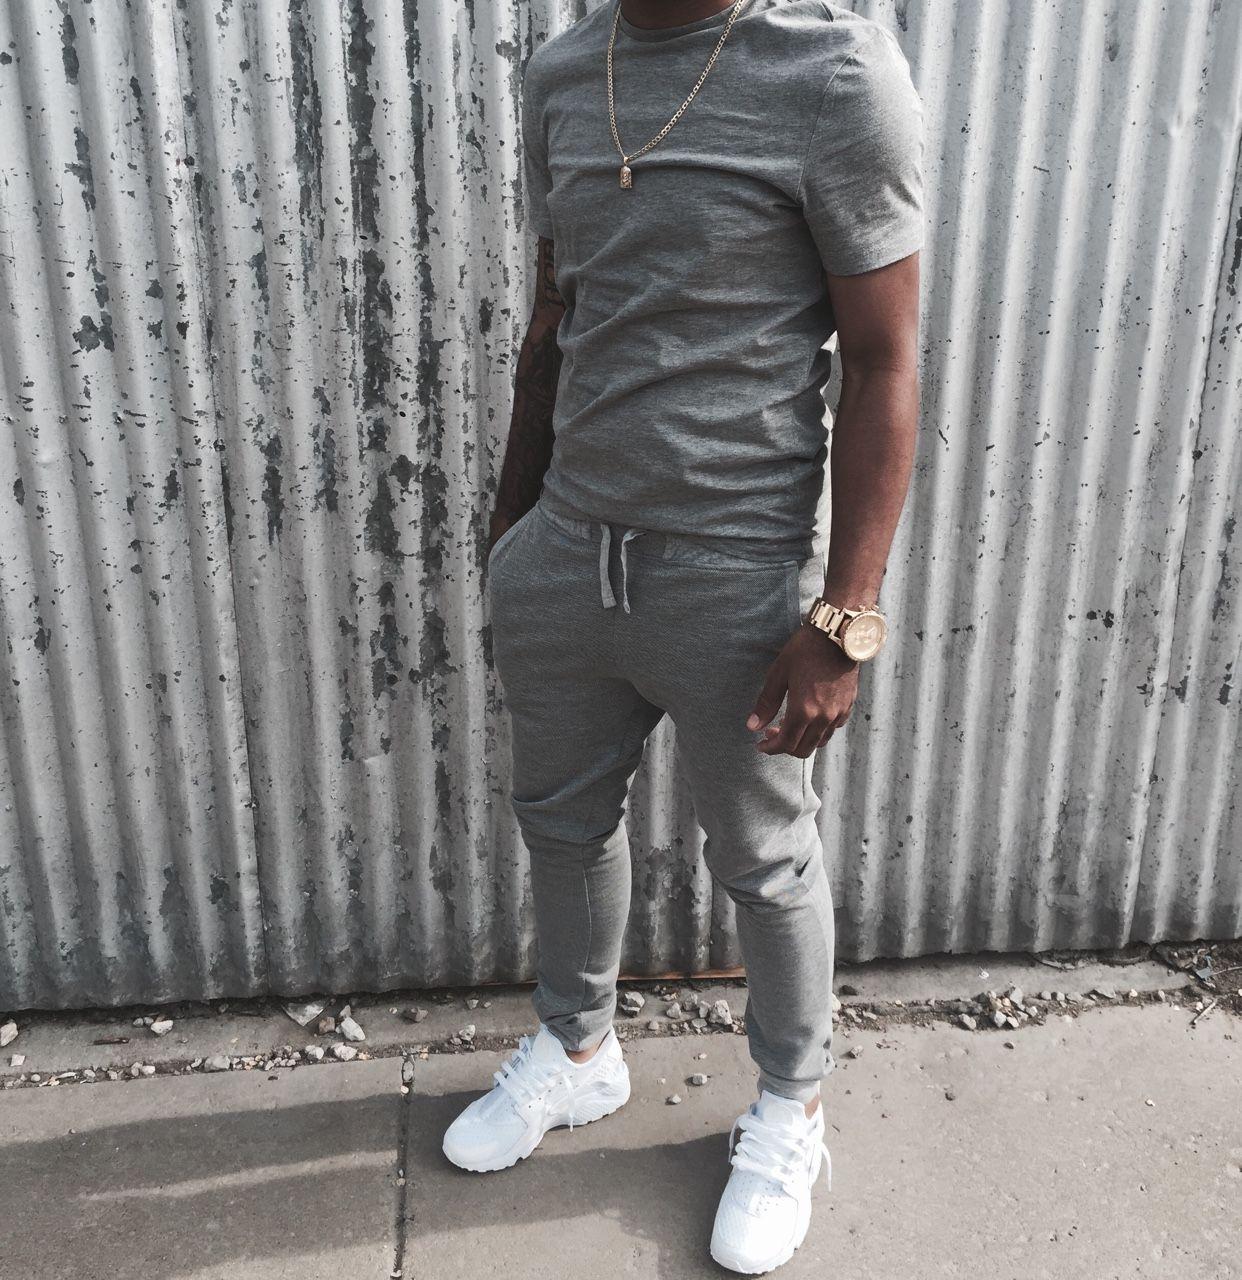 ḹ\u20a5קᎧƧƨῗɓŁḕ Moda Men, Nike Men Fashion, Fashion Moda, Urban Fashion,